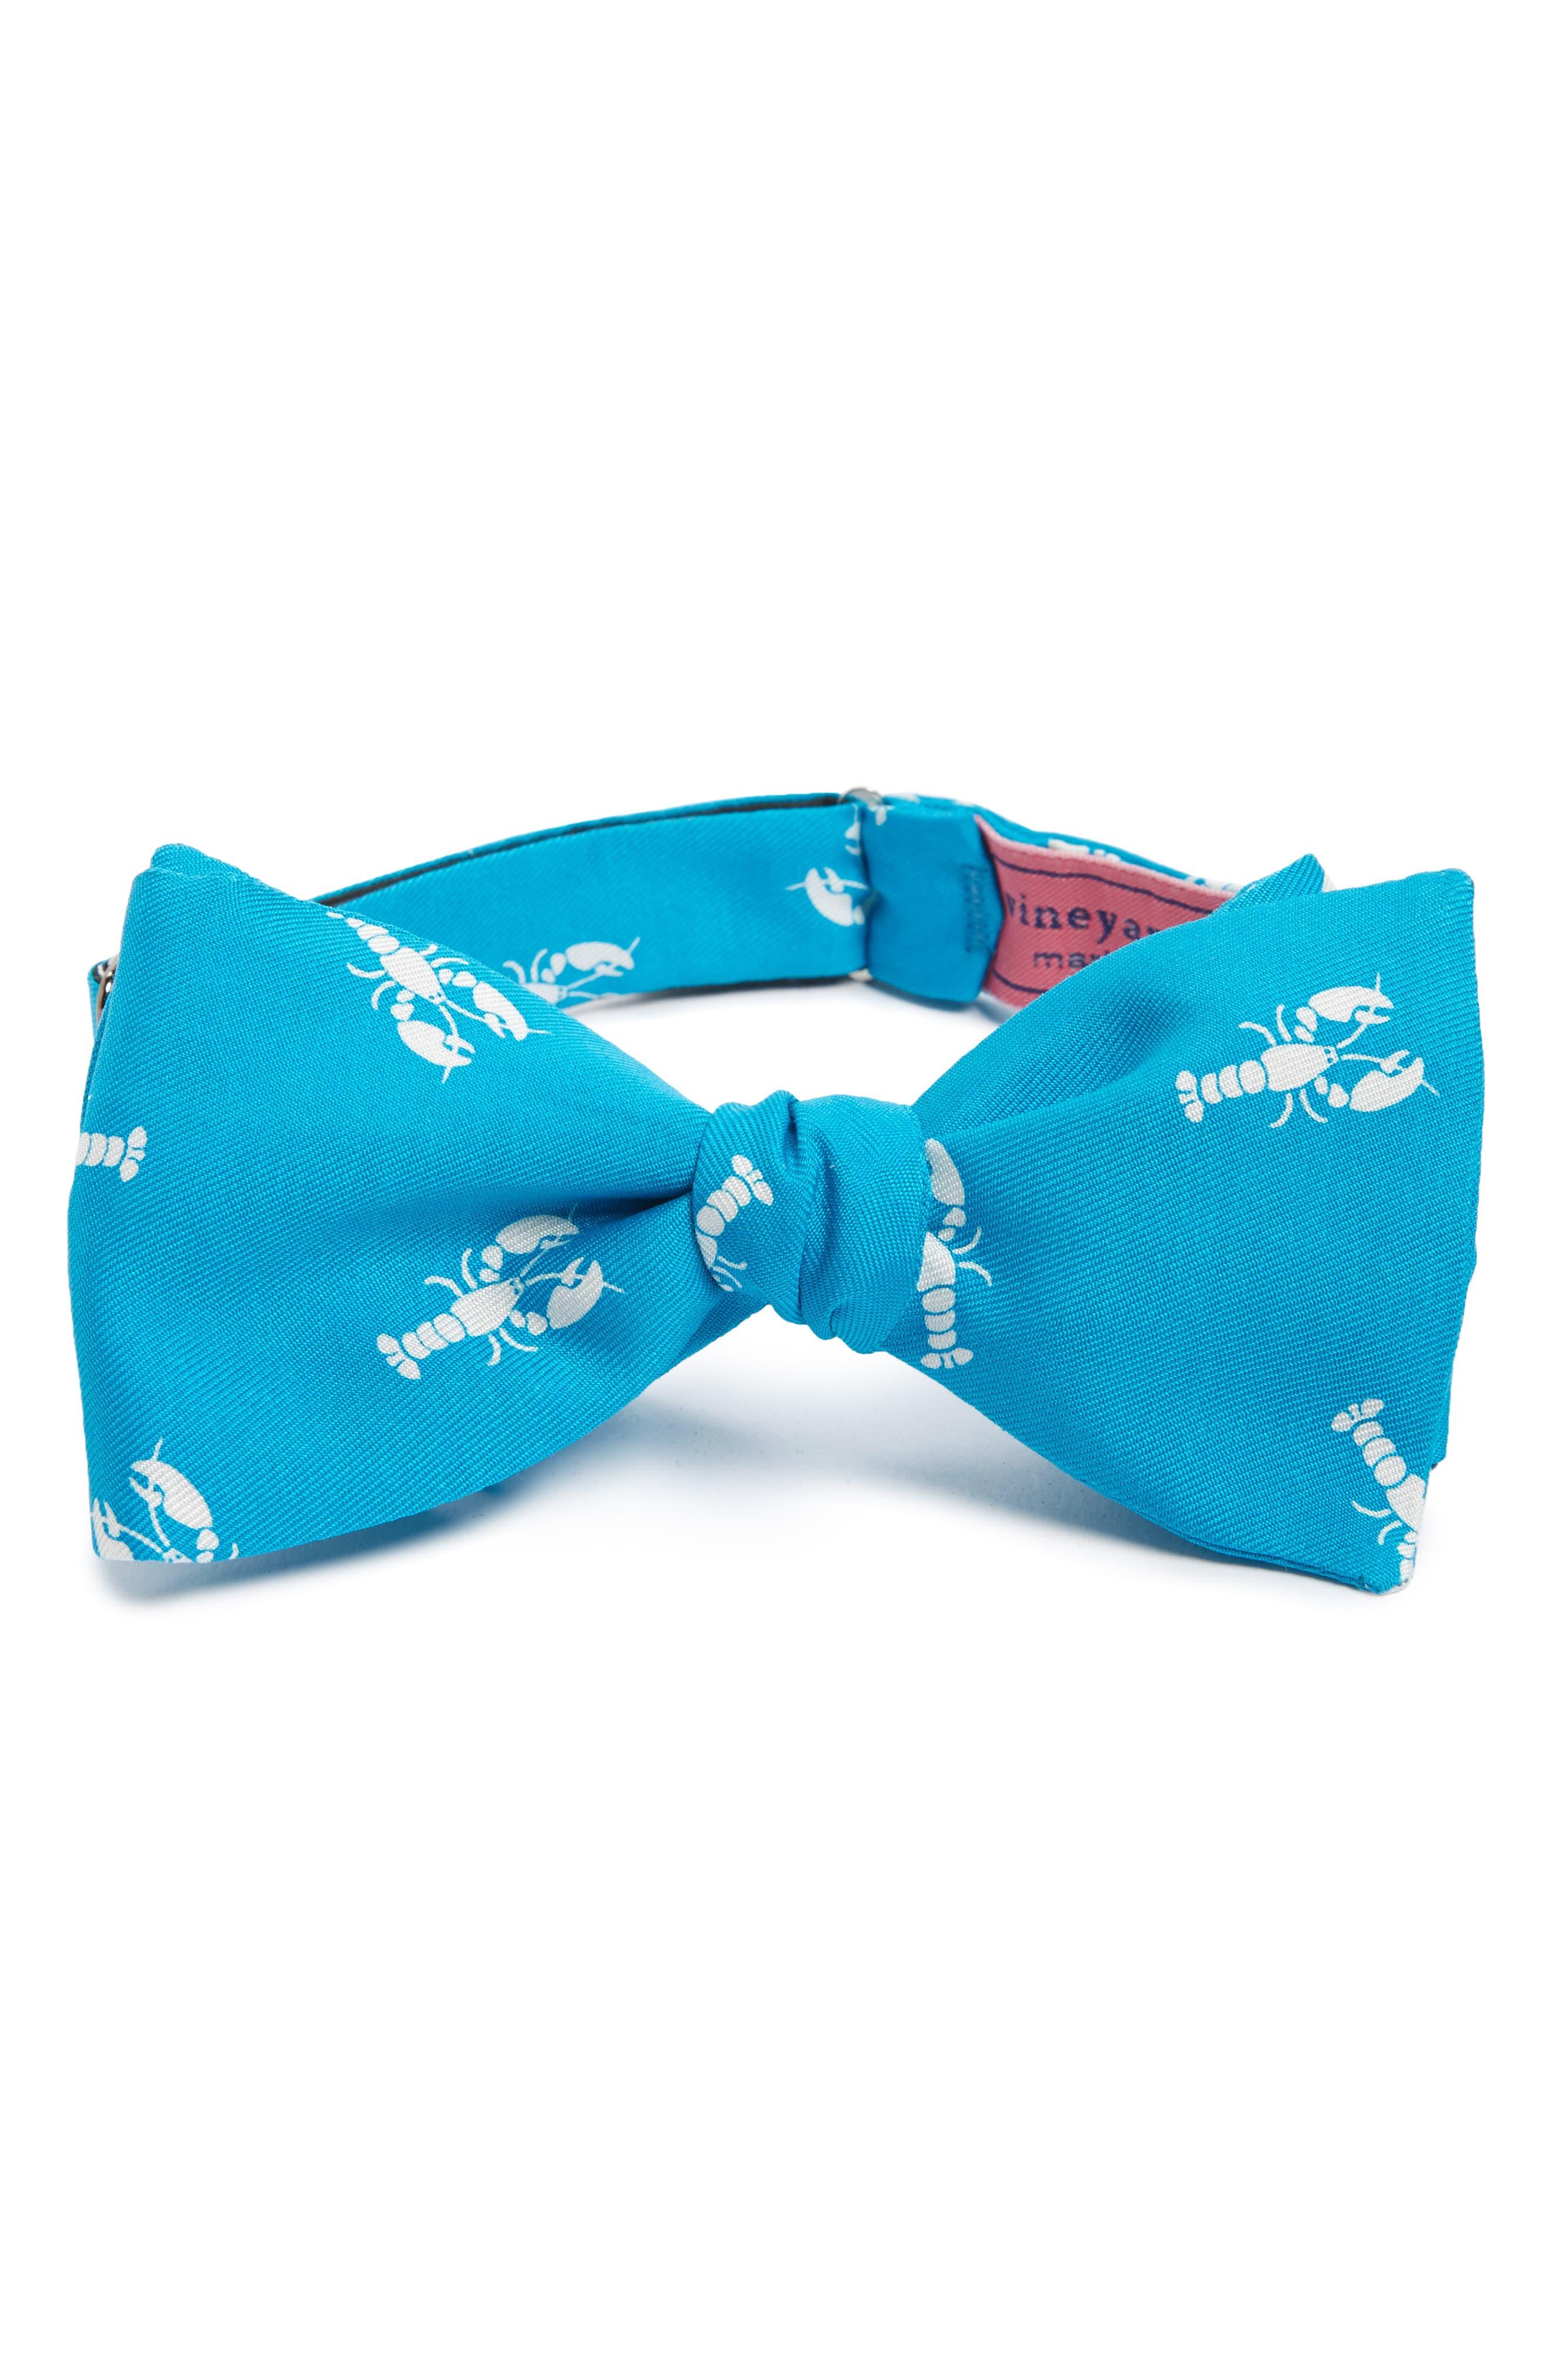 Lobster Bow Tie,                         Main,                         color, 441